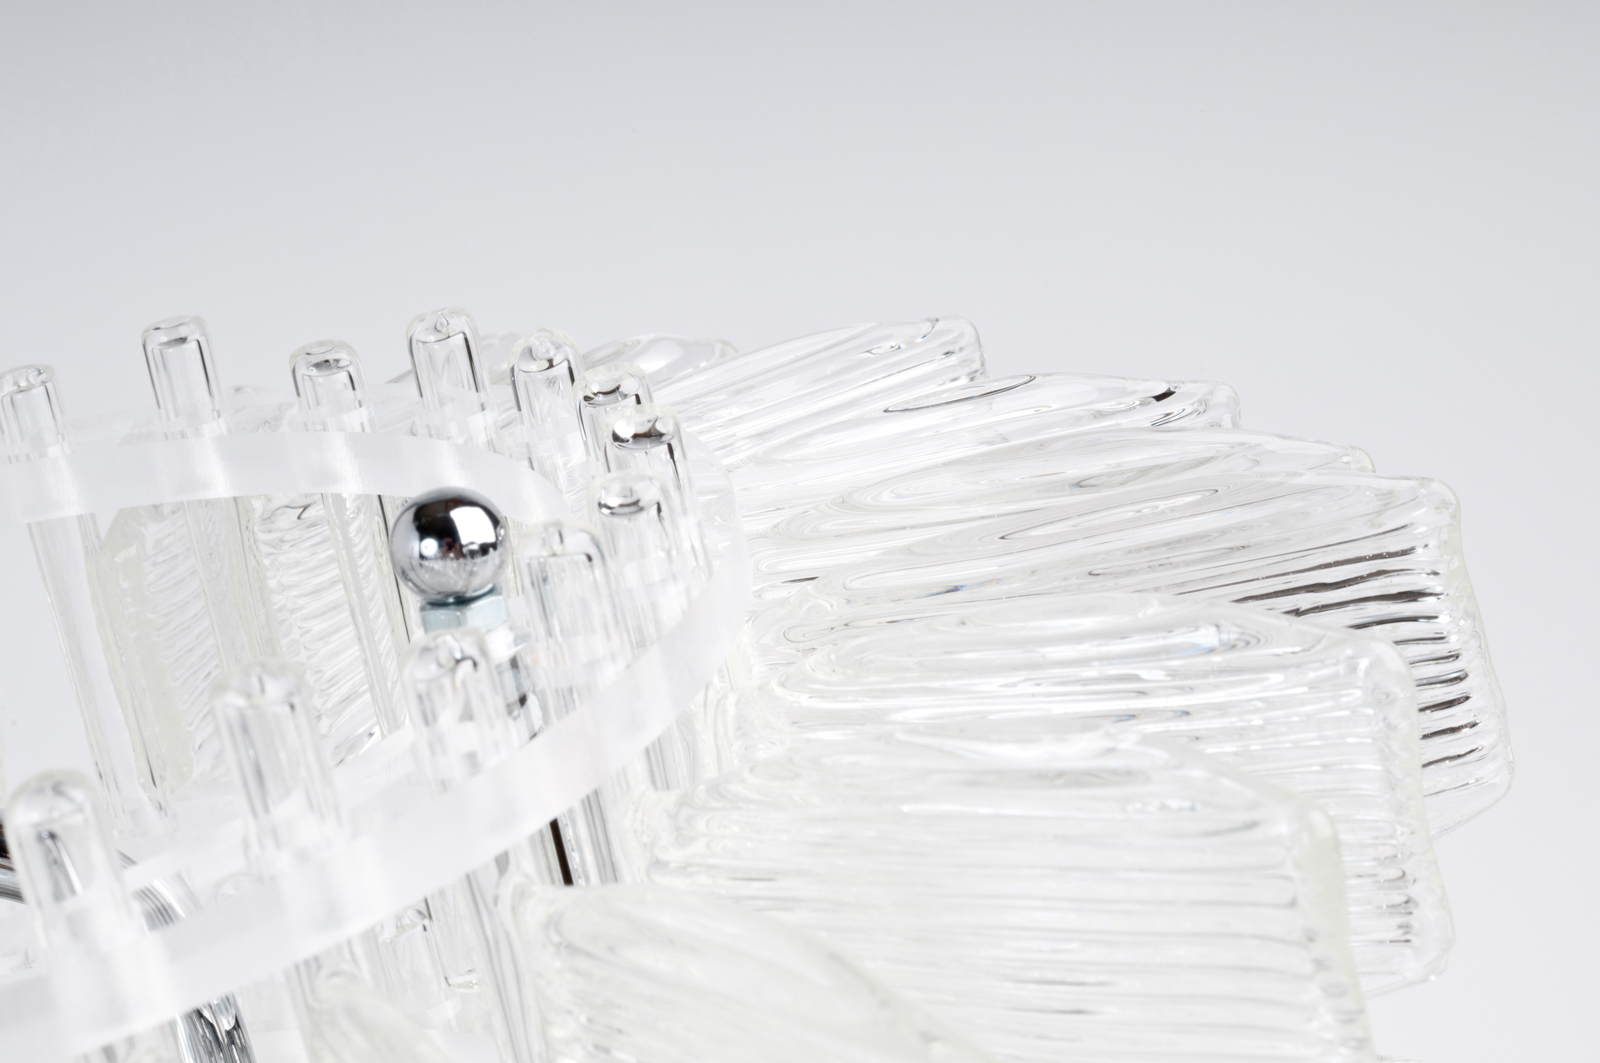 anemone-20-table-chrome-cristal-crystal-veronese-maurizio-galante-tal-lancman-31.jpg